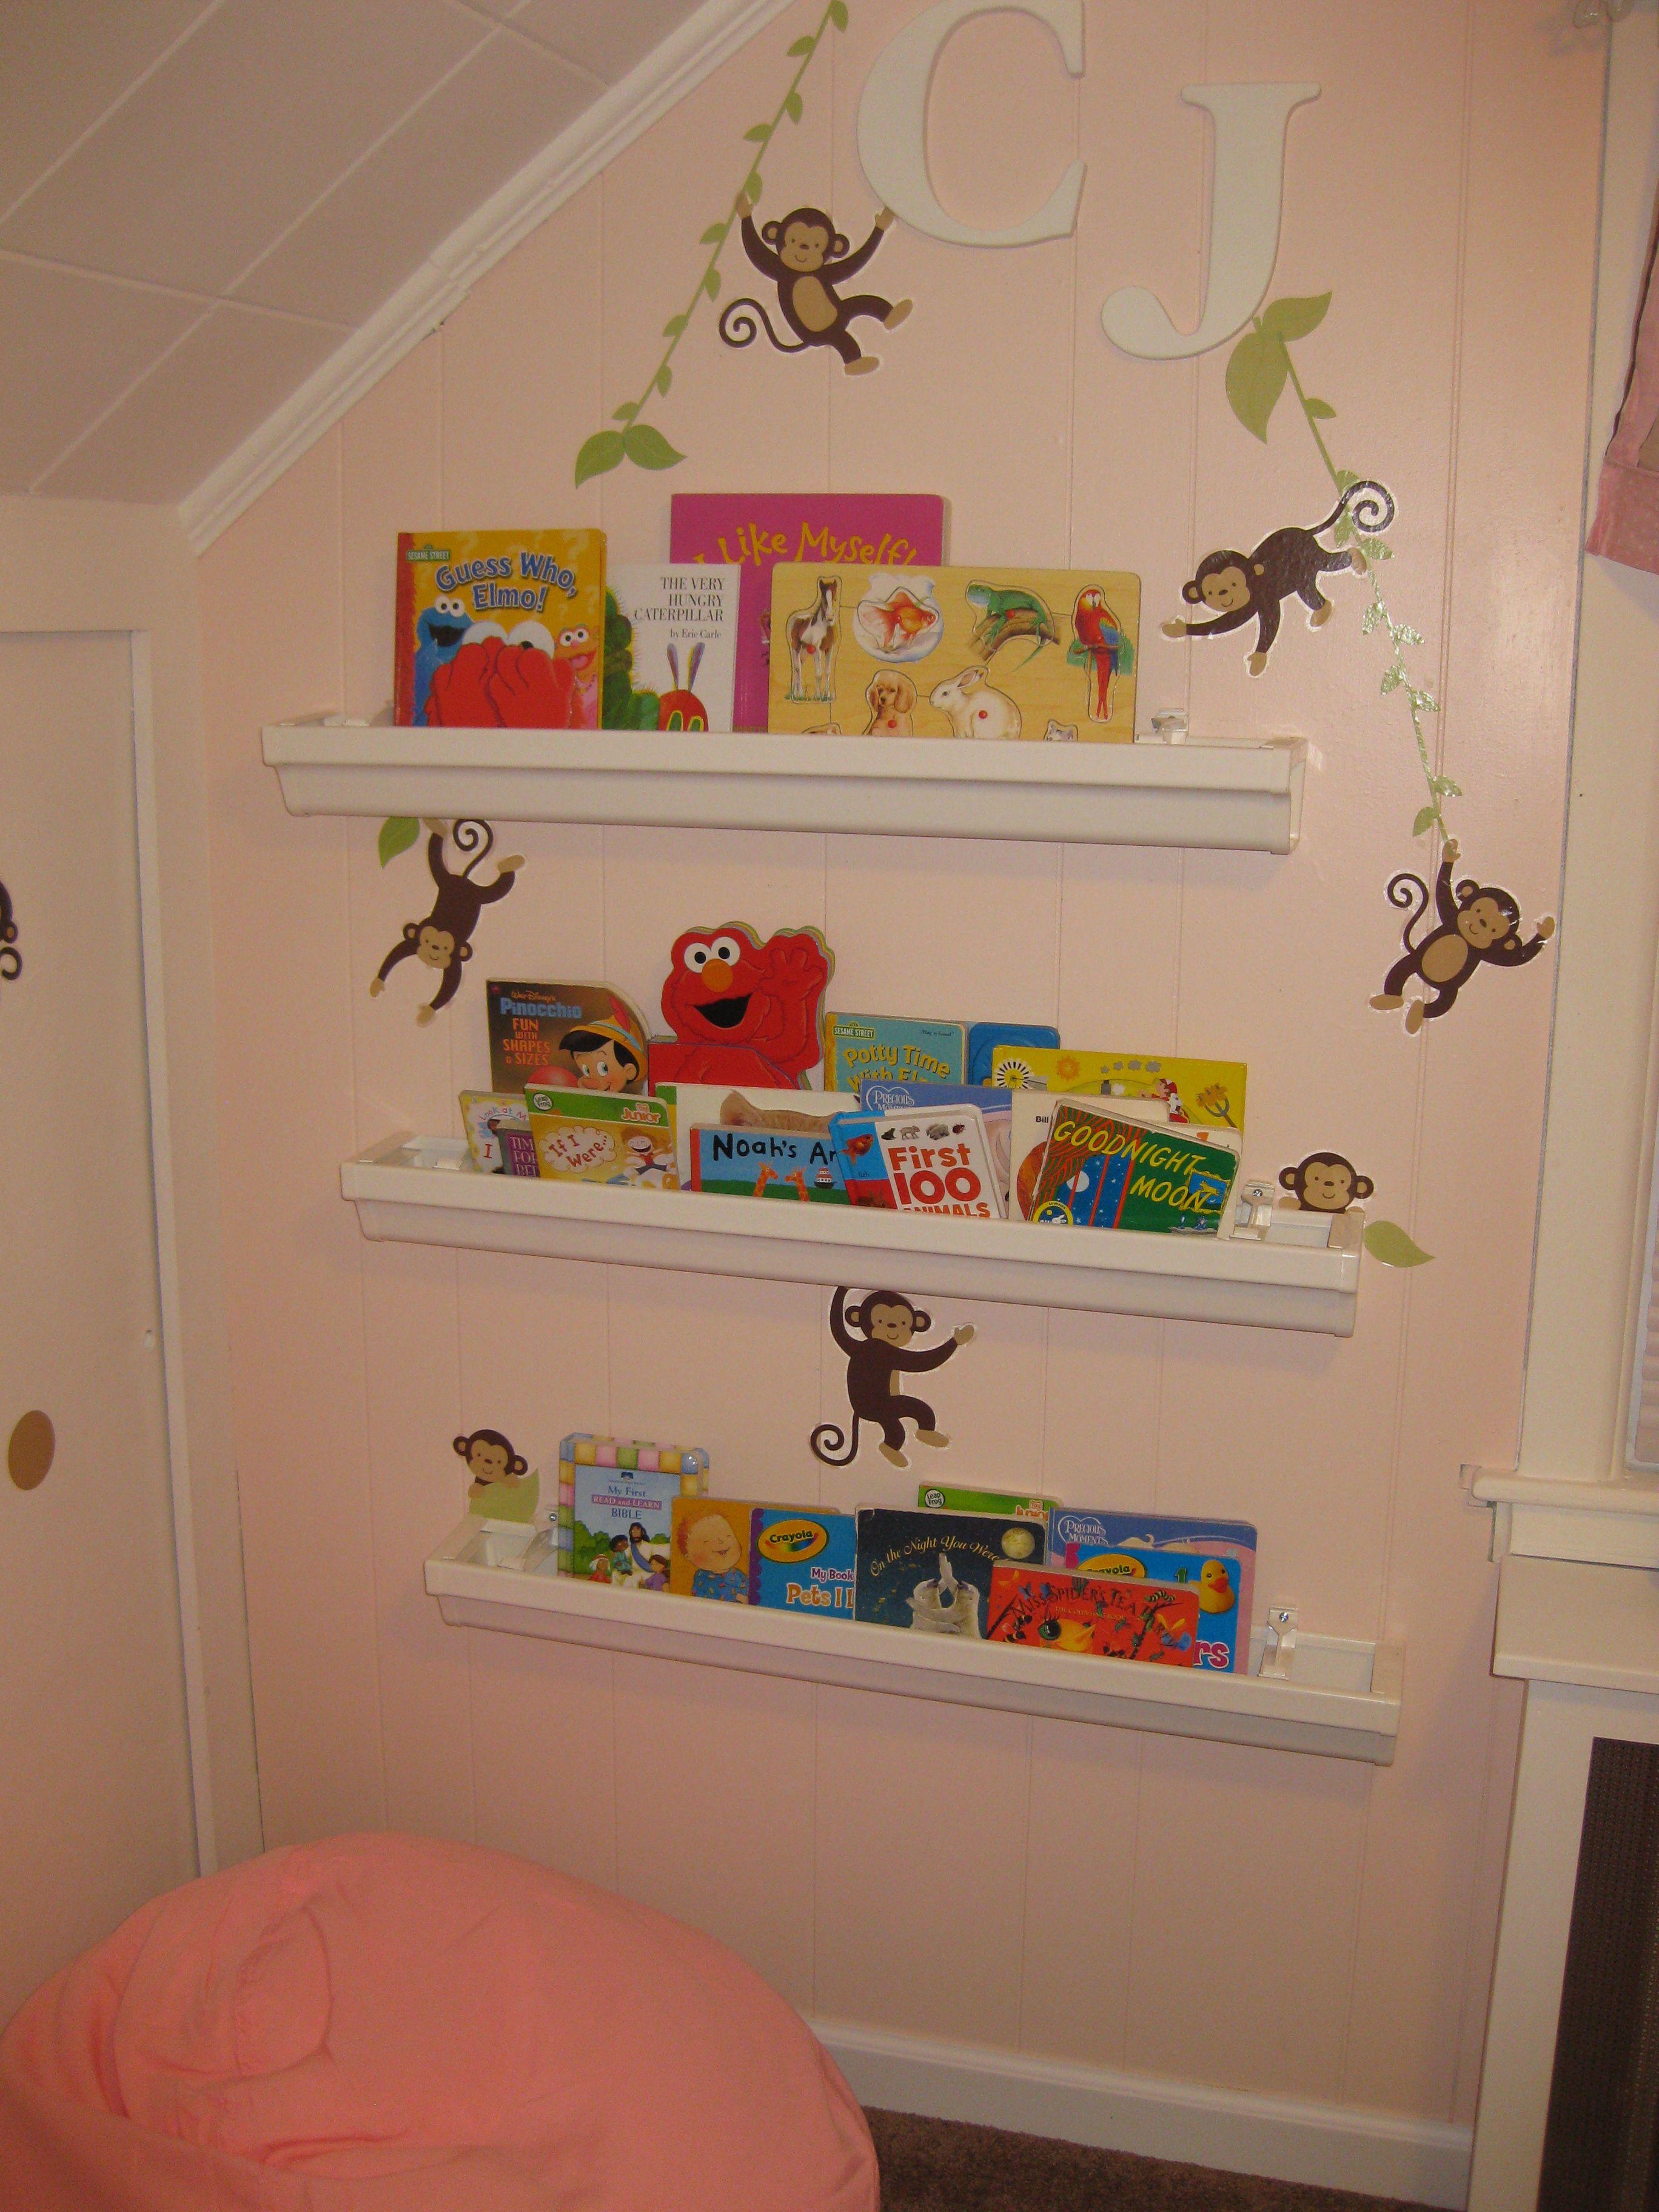 Do It Yourself Bookshelf Ideas: Do It Yourself Project: Rain Gutter Bookshelves